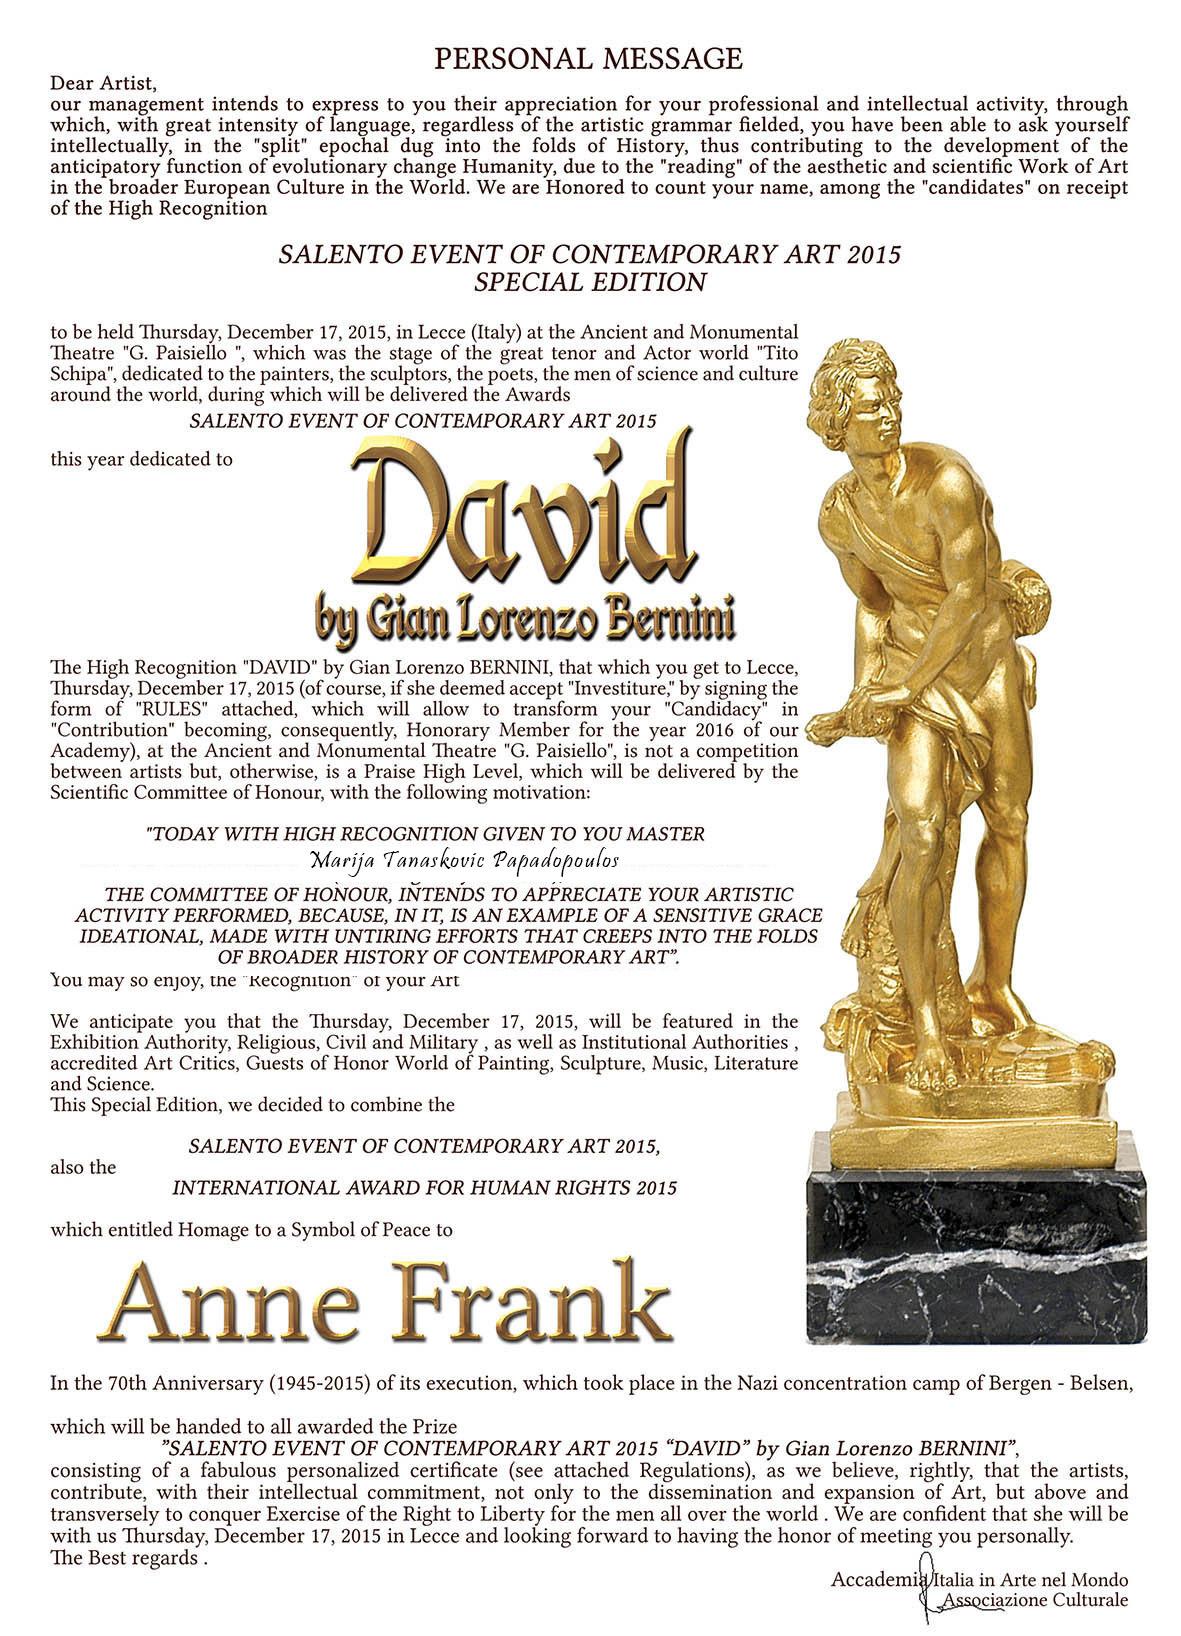 PERSONAL-MESSAGE-AND-REGULATION-DAVID-BERNINI-AWARD--2015.jpg